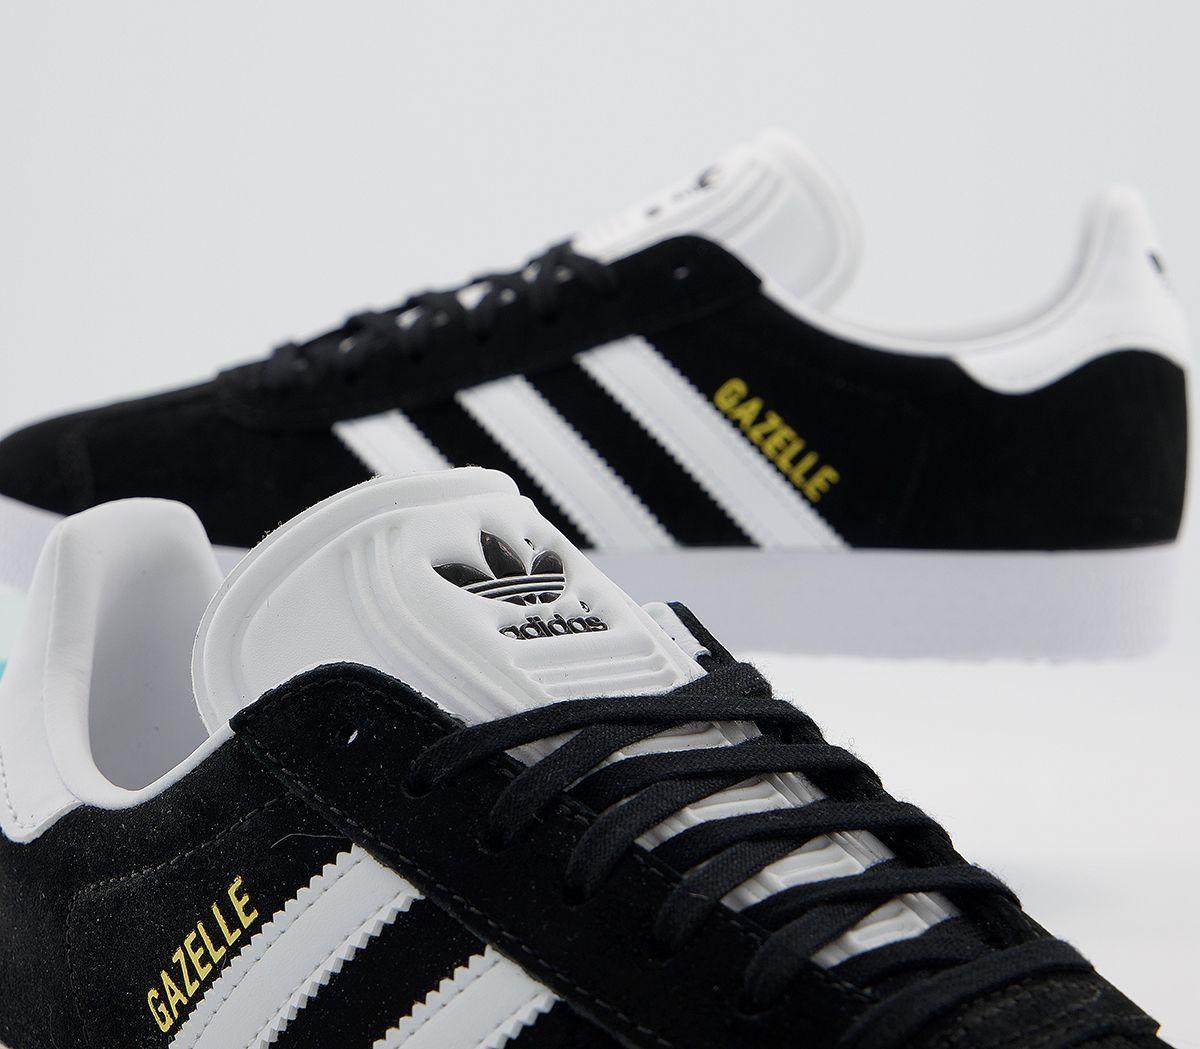 factory authentic new specials wholesale outlet Adidas Gazelle Core Noir Blanc Baskets Chaussures | eBay